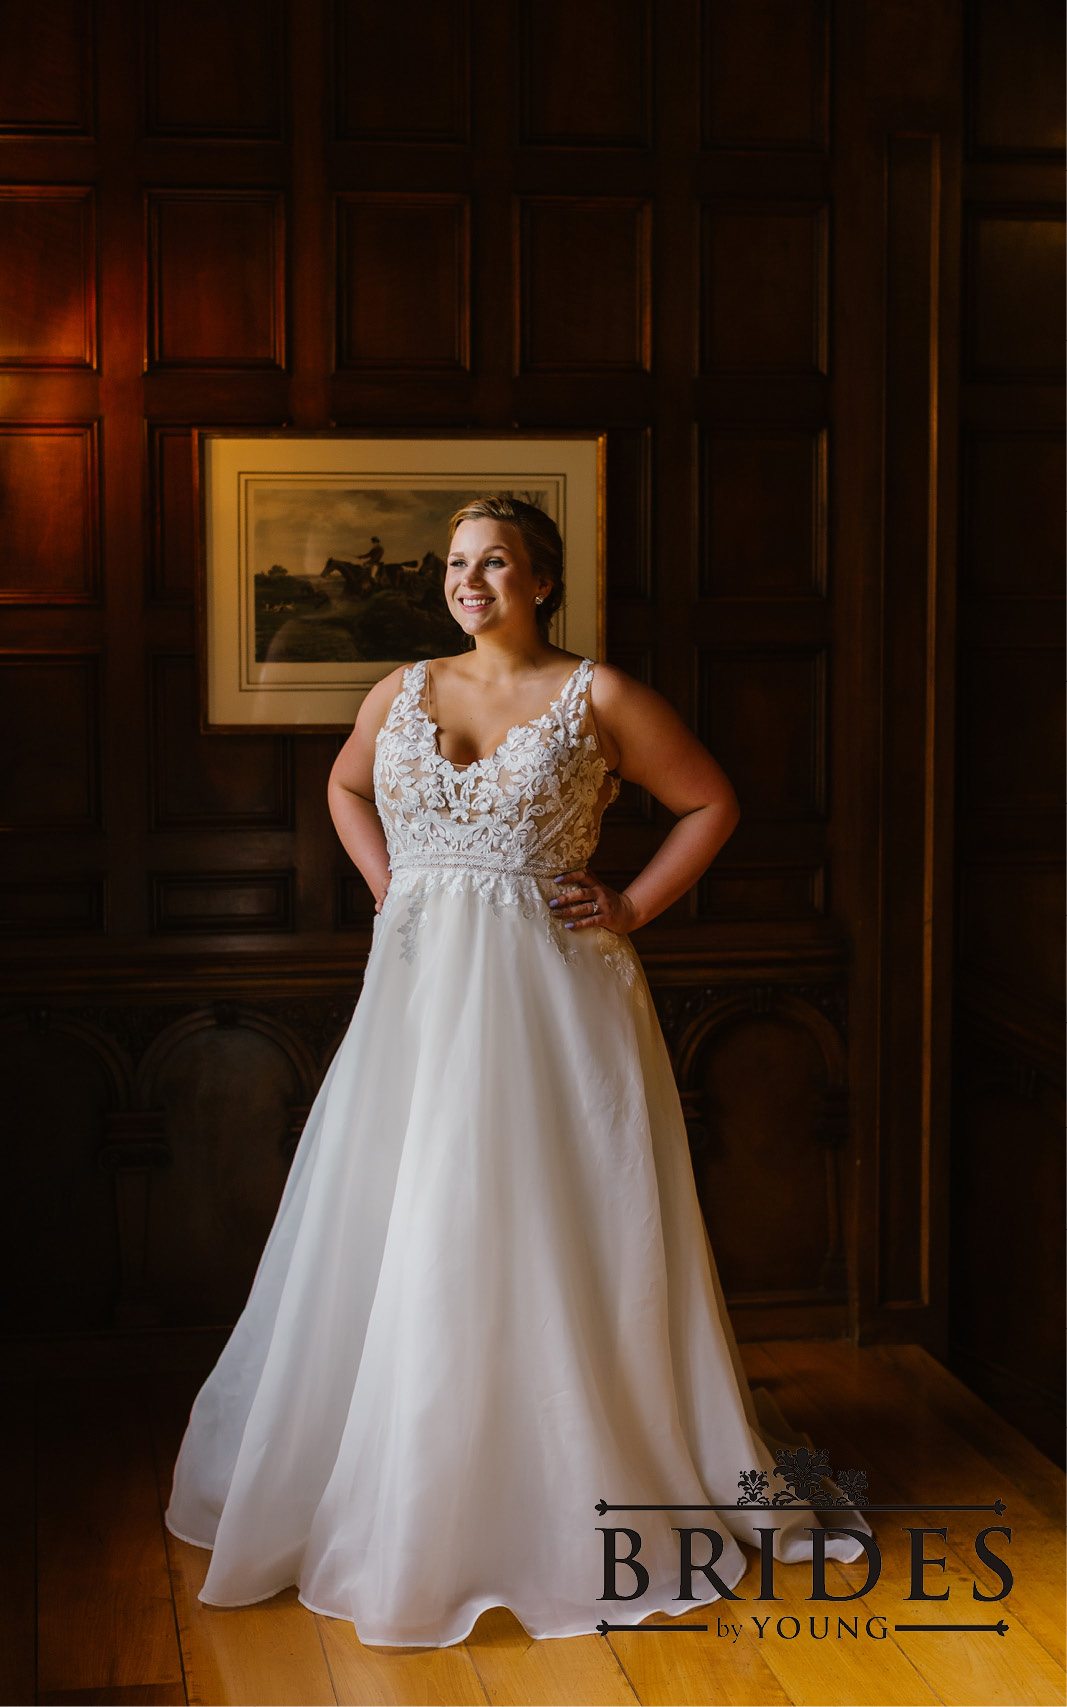 BridesbyYoung-2020Collection-PlusSizeBridalBoutique-CurvyWeddingDressInspiration-136.jpg